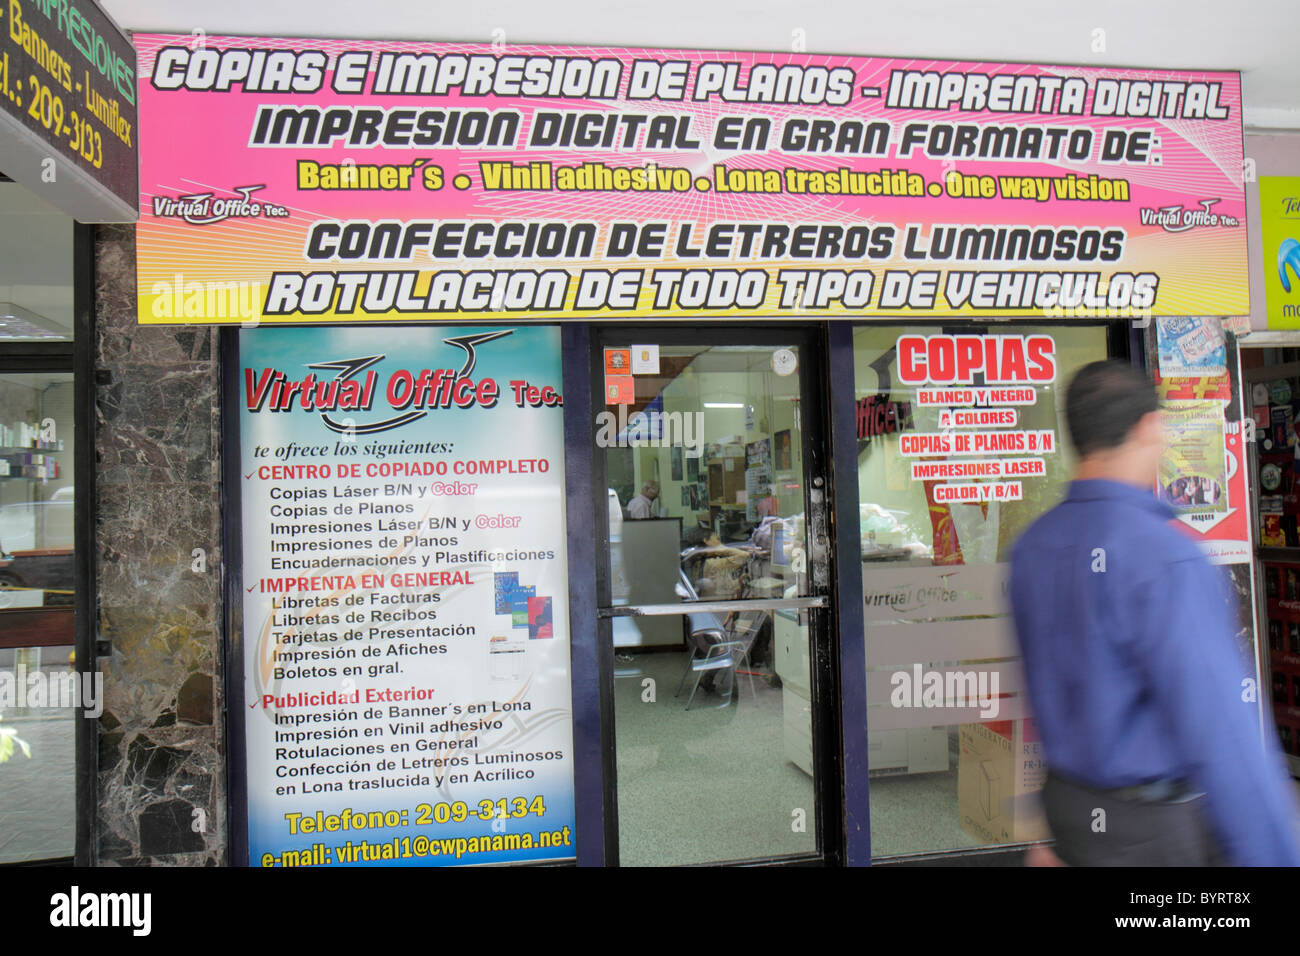 city bella vista business storefront full service city bella vista business storefront full service print shop copying digital printing banners flyers sign spanish